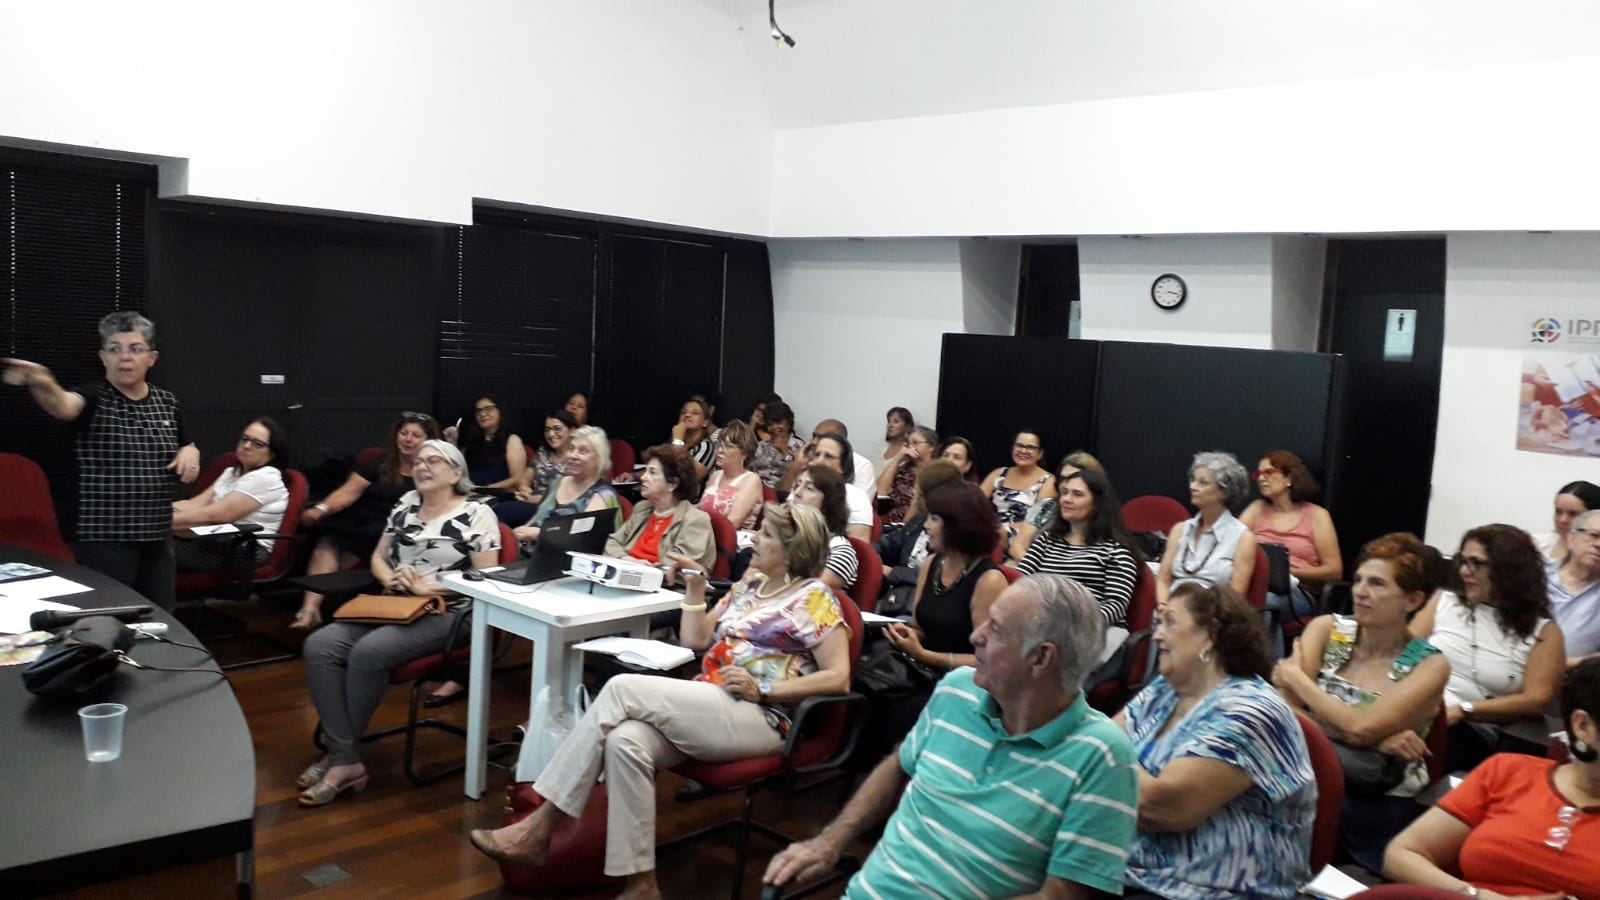 Read more about the article RECORDE DE INSCRIÇÕES EM 5 DIAS